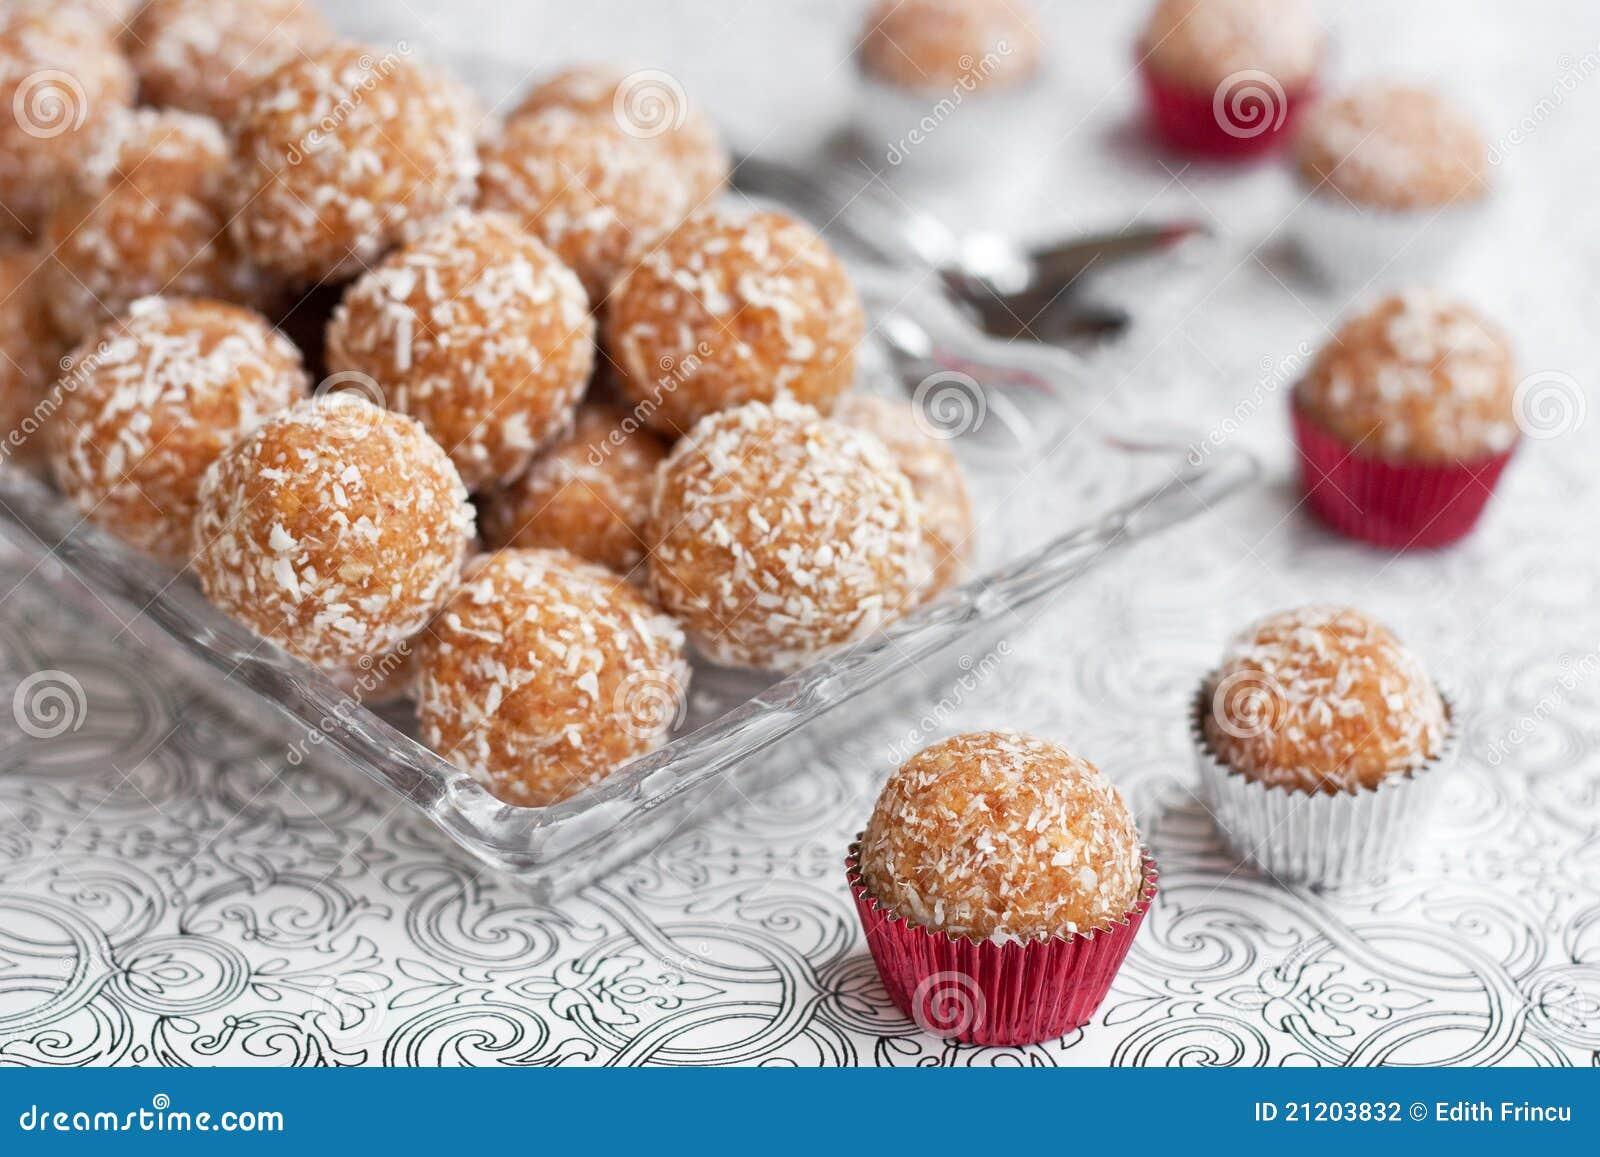 Biscuits Using Cake Flour Recipe